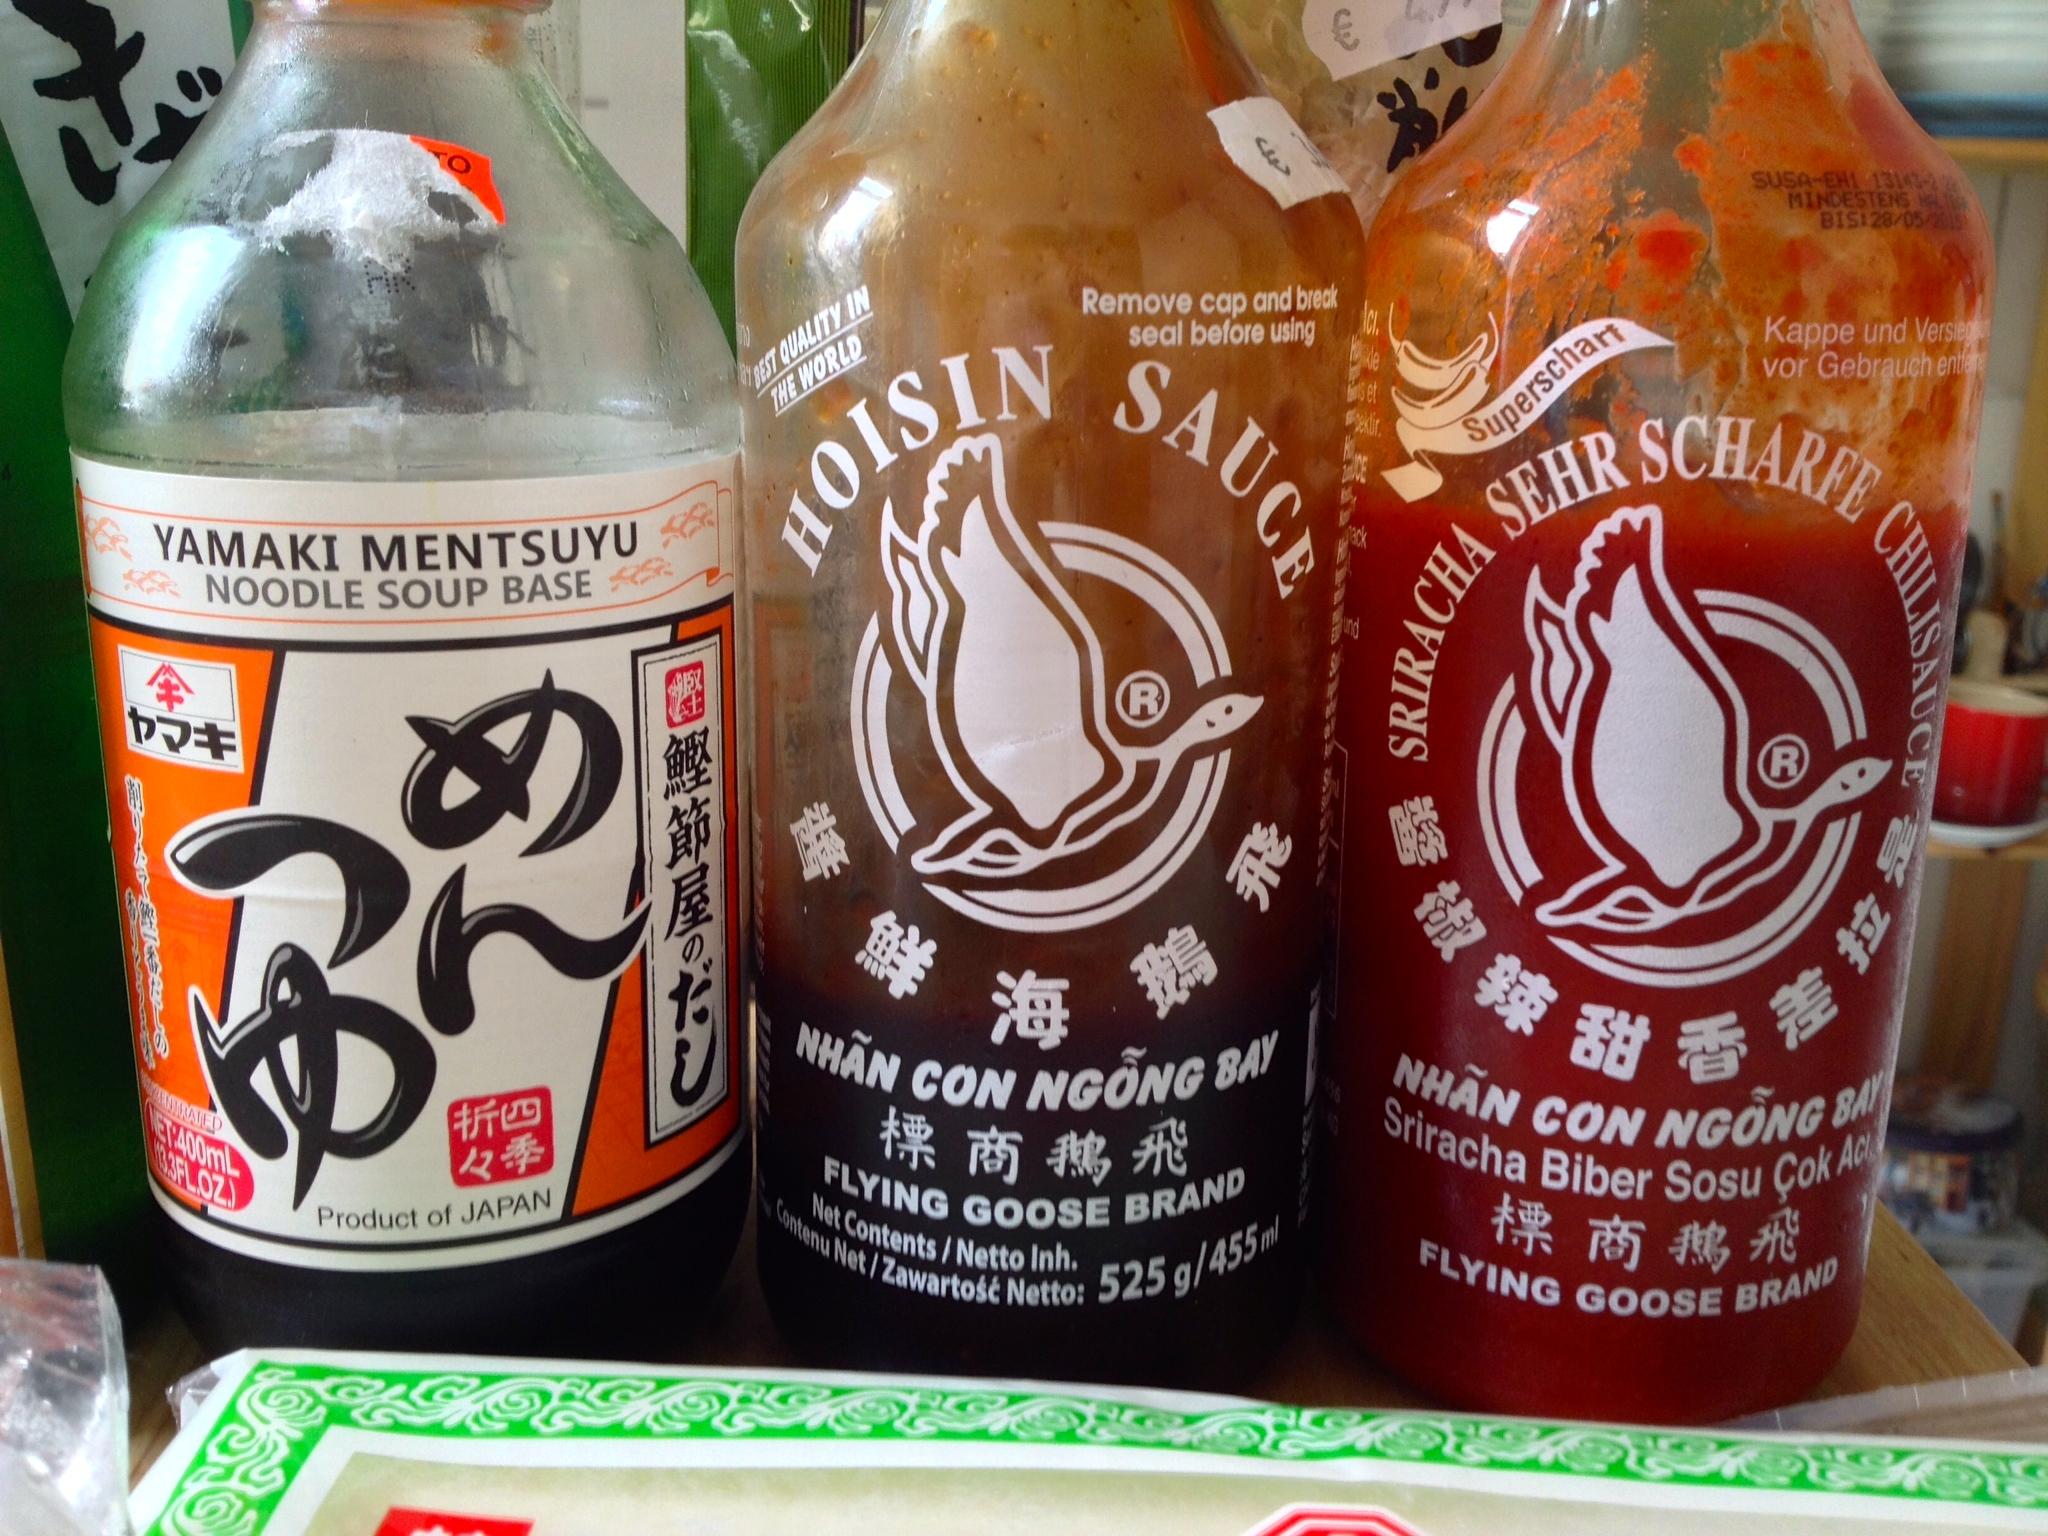 Mentsuyu soup base, hoisin sauce, and sriracha